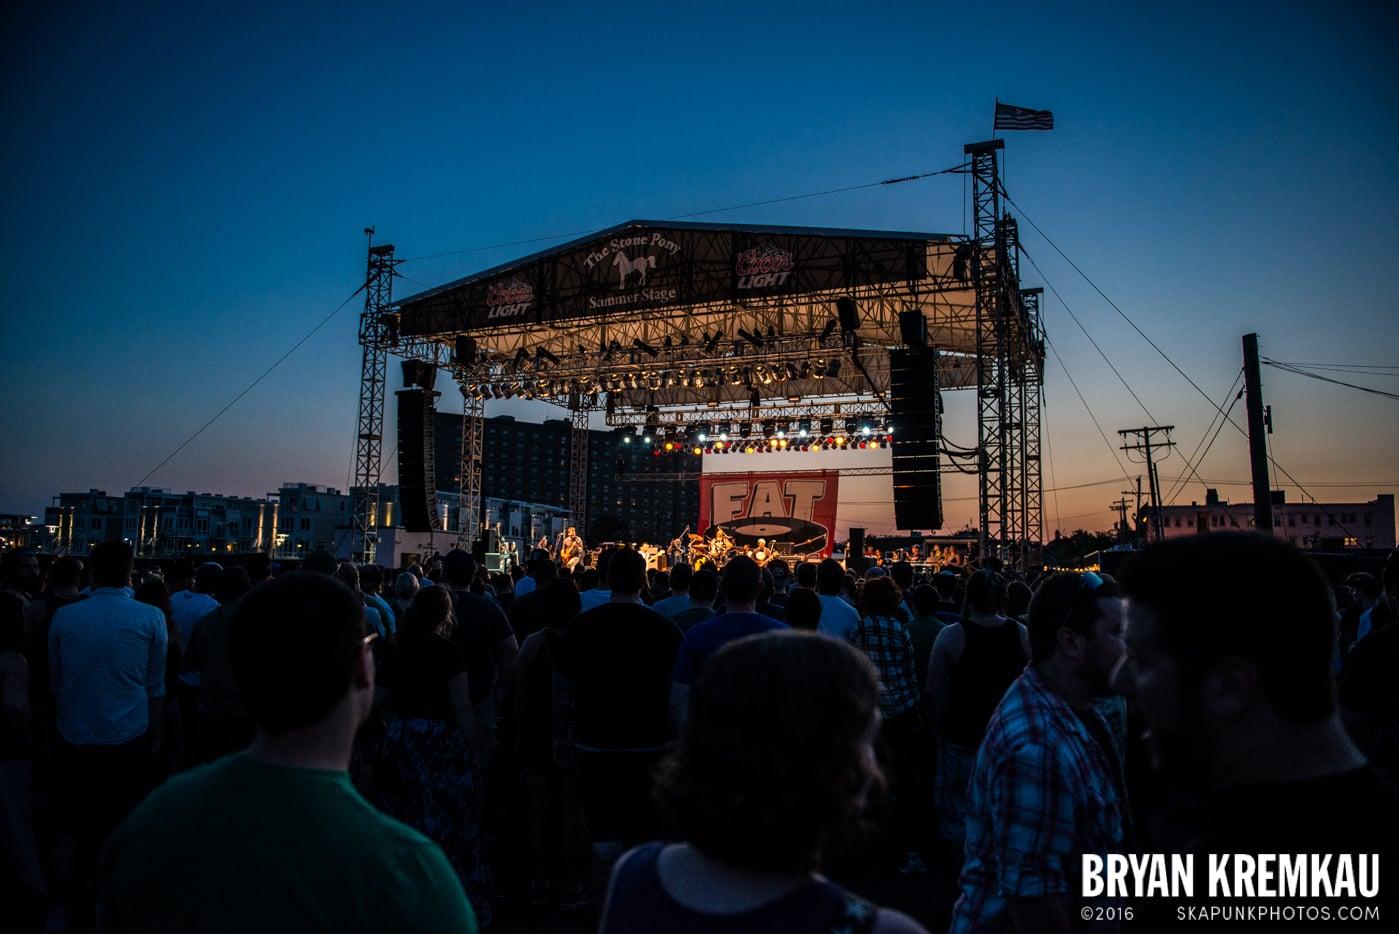 Lagwagon @ Stone Pony Summer Stage, Asbury Park, NJ - 8.15.15 (5)